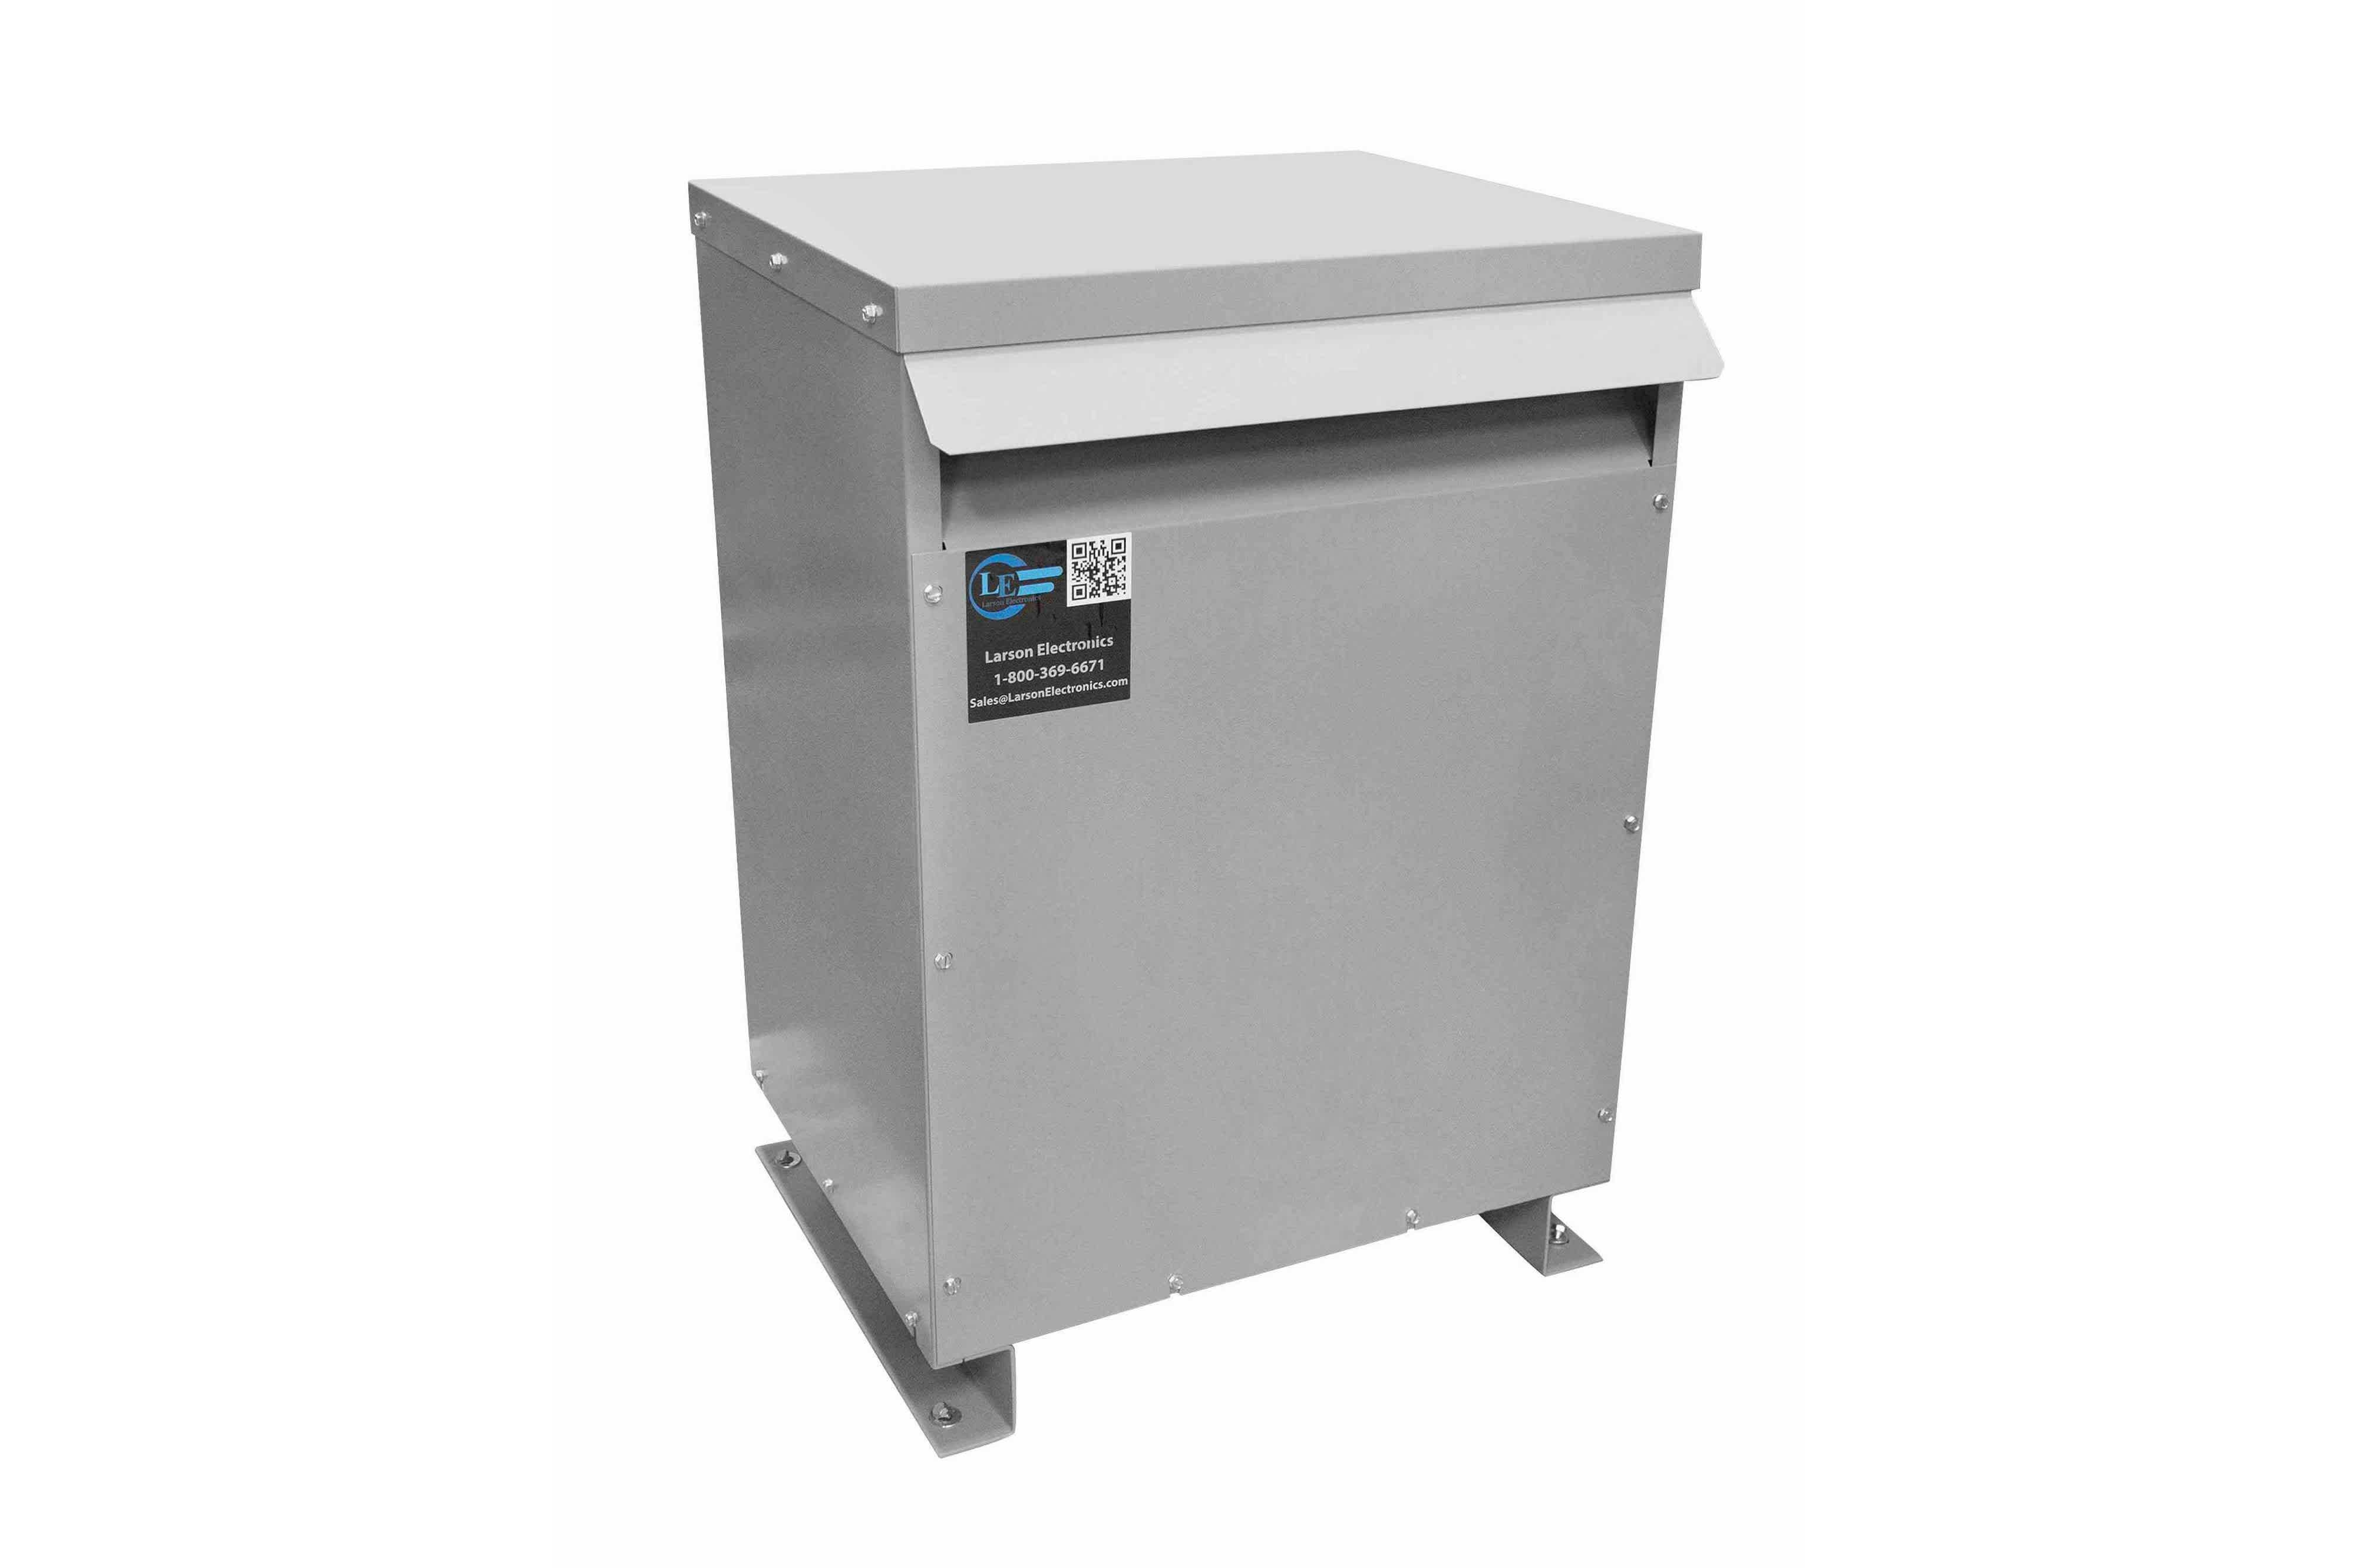 12 kVA 3PH Isolation Transformer, 480V Wye Primary, 480V Delta Secondary, N3R, Ventilated, 60 Hz